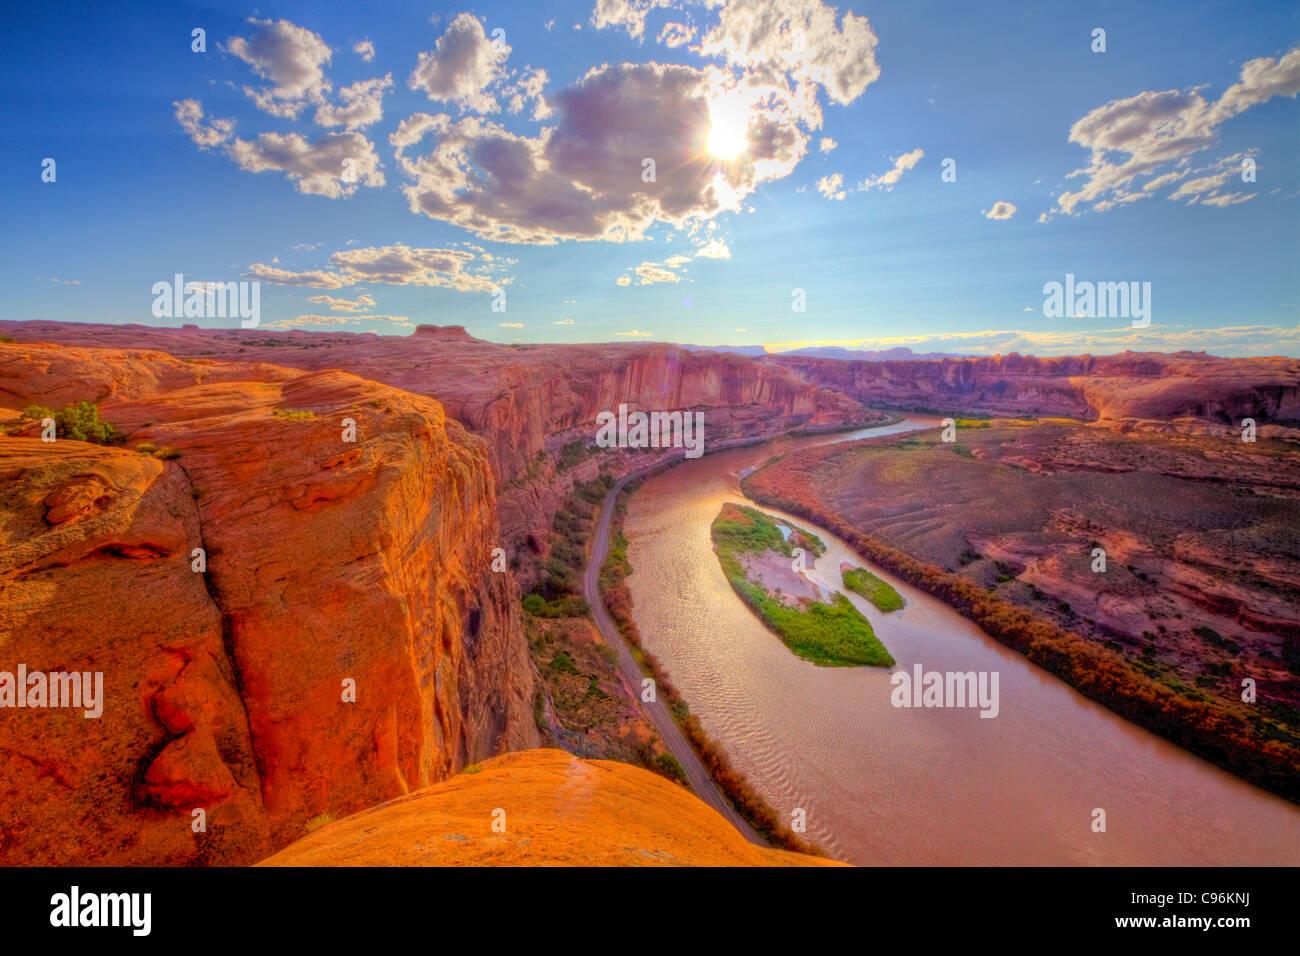 Vista del Río Colorado cerca de Moab, Utah, Hell's Revenge paredes de arenisca de Glen Canyon Trail Foto de stock